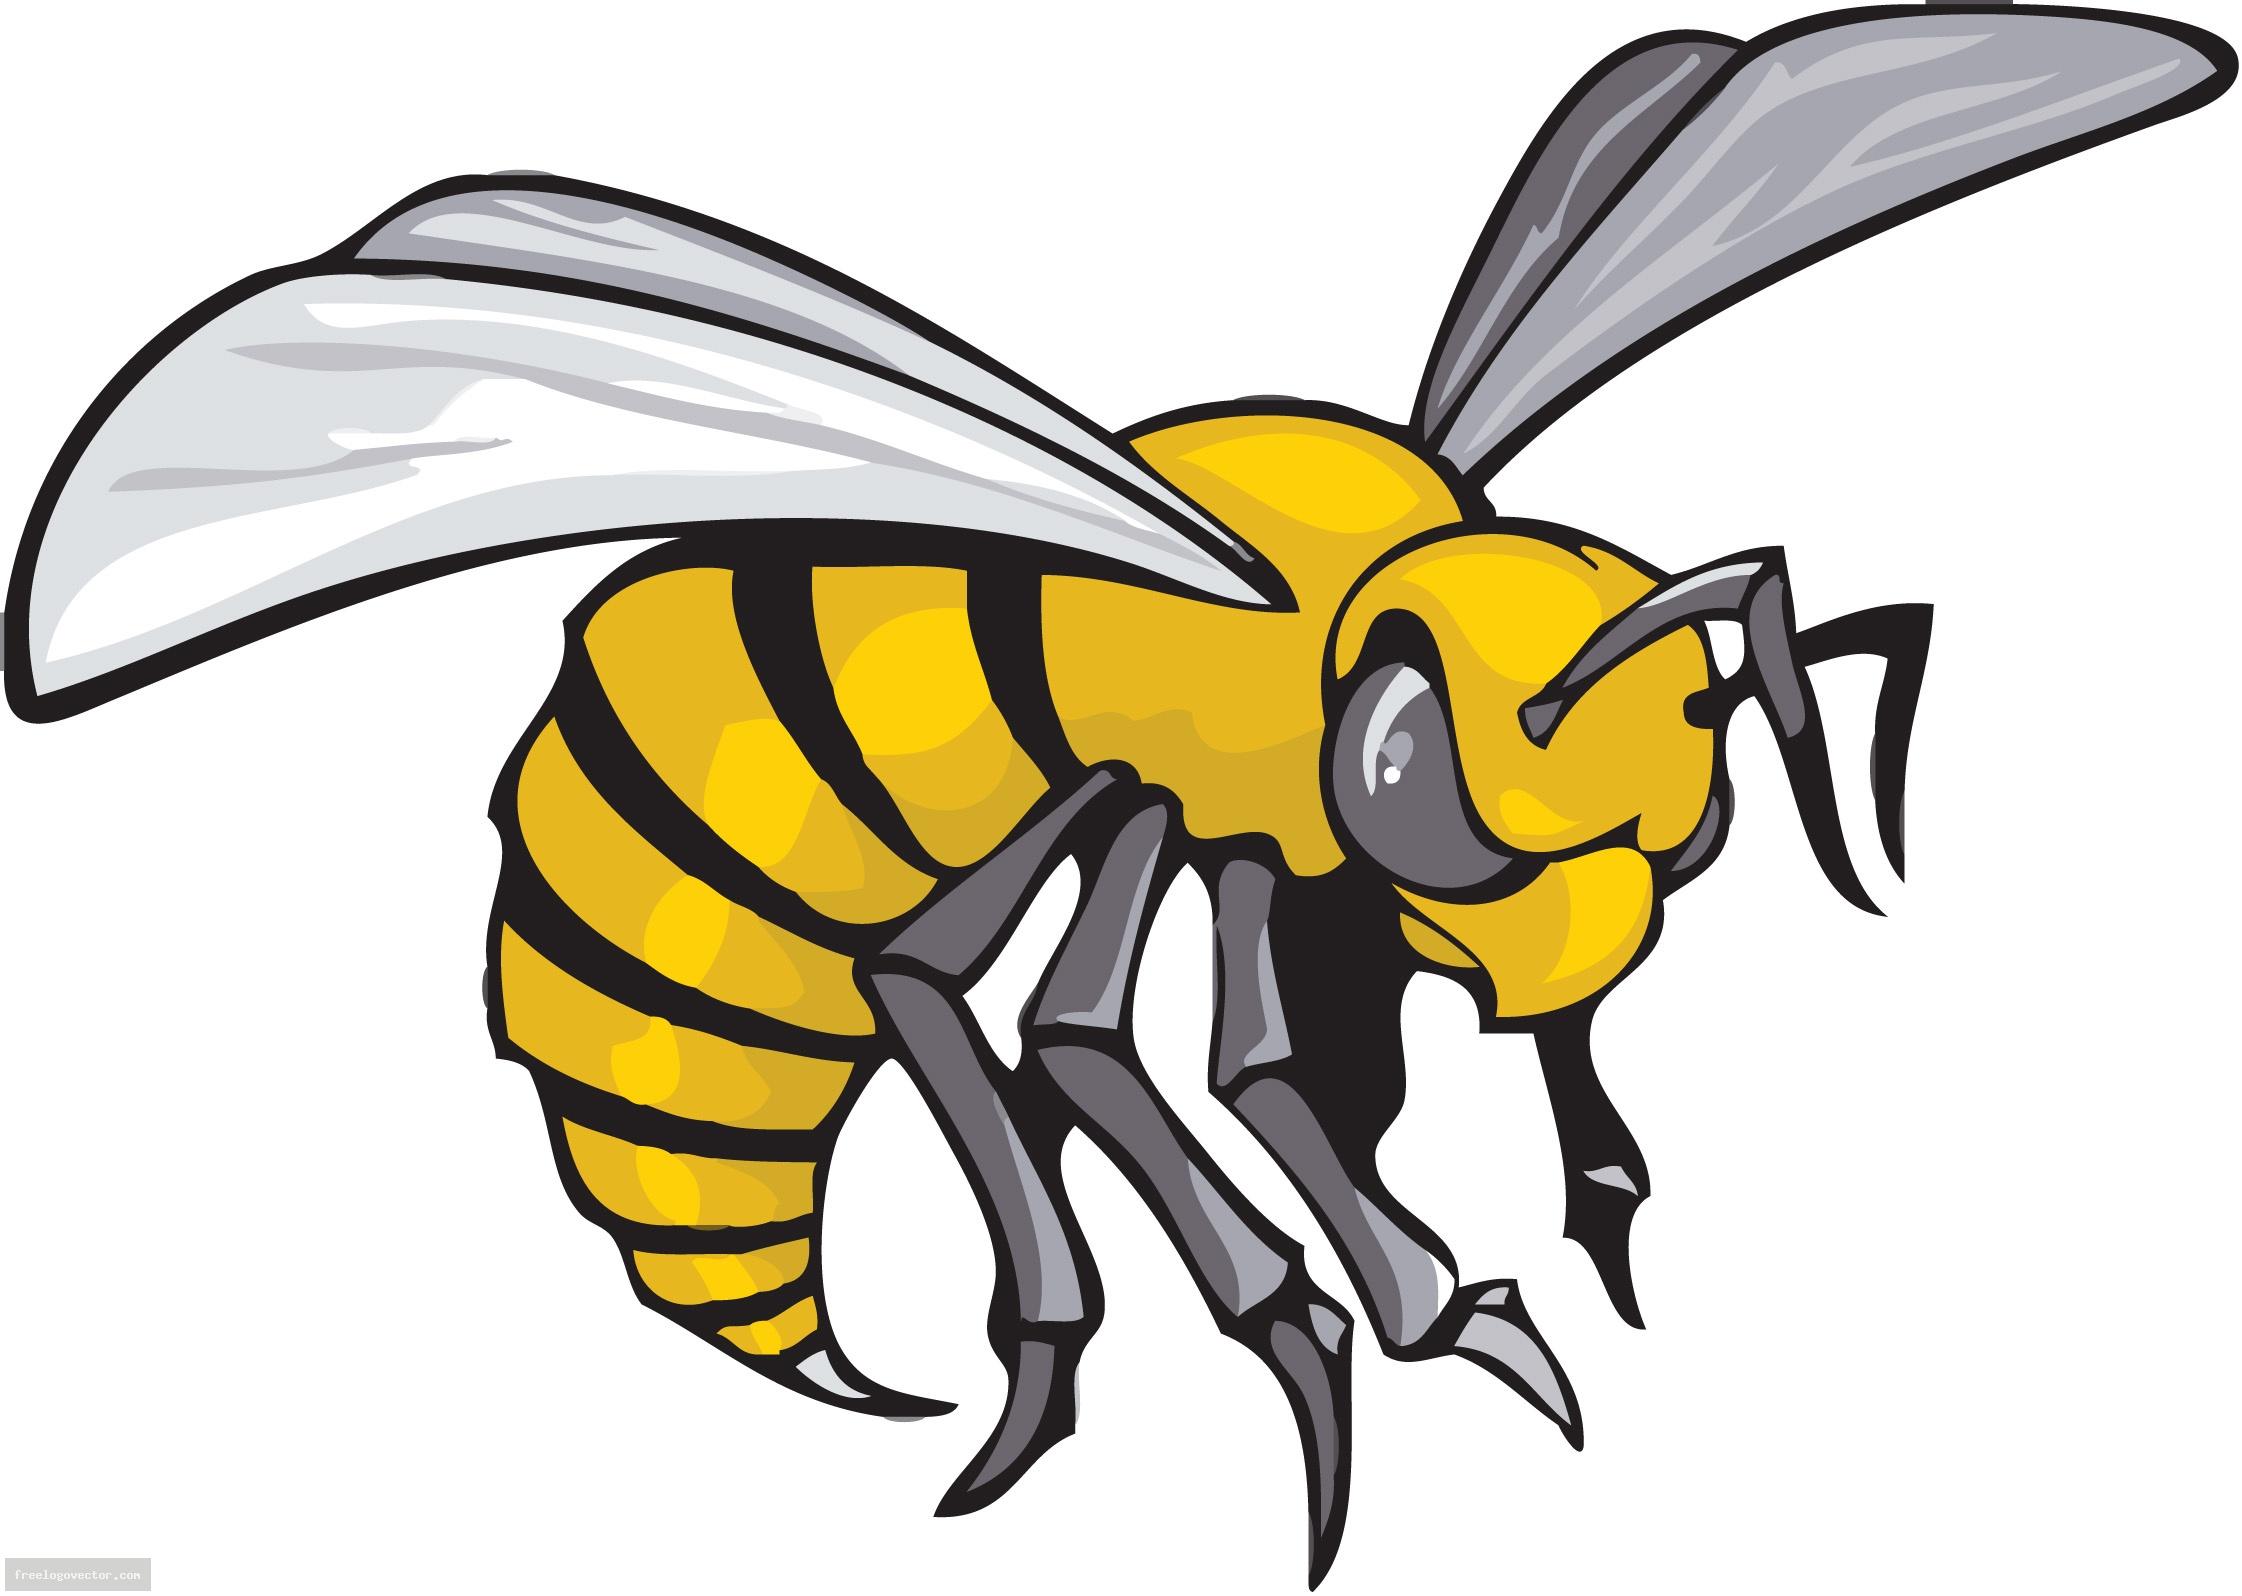 jpg free download Hornet clipart mascot. Wikiclipart